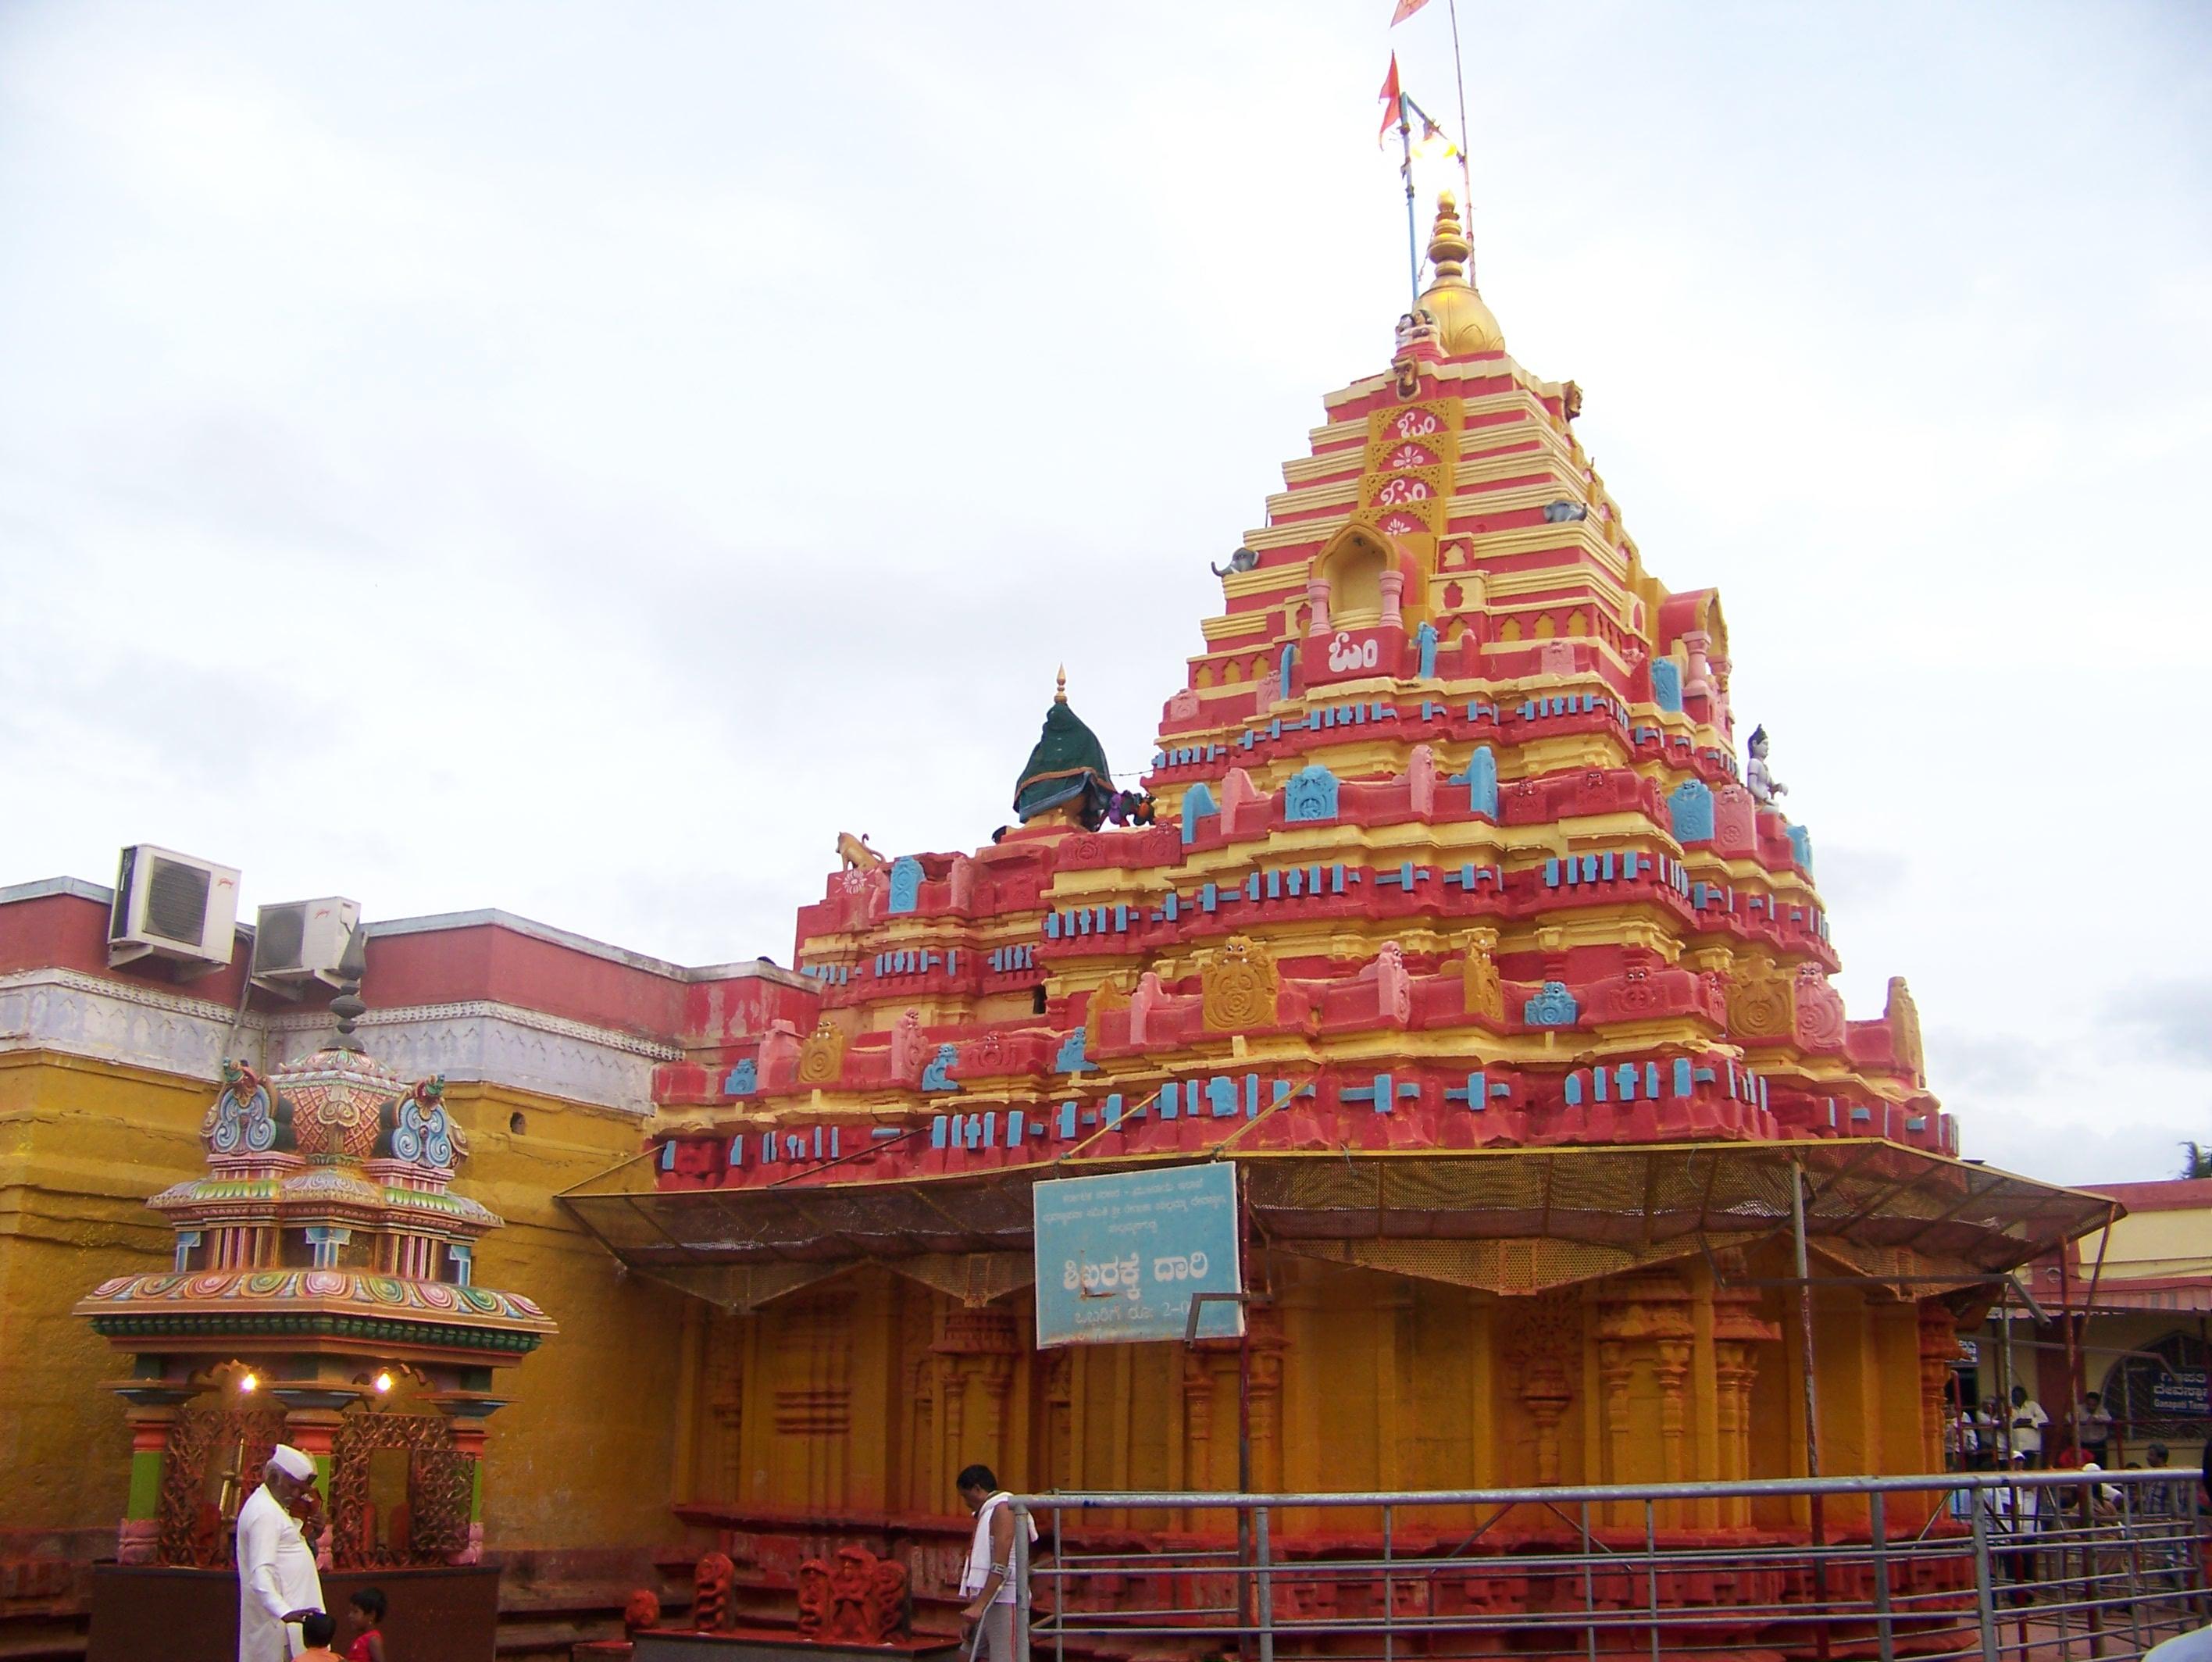 Savadatti Yellamma temple